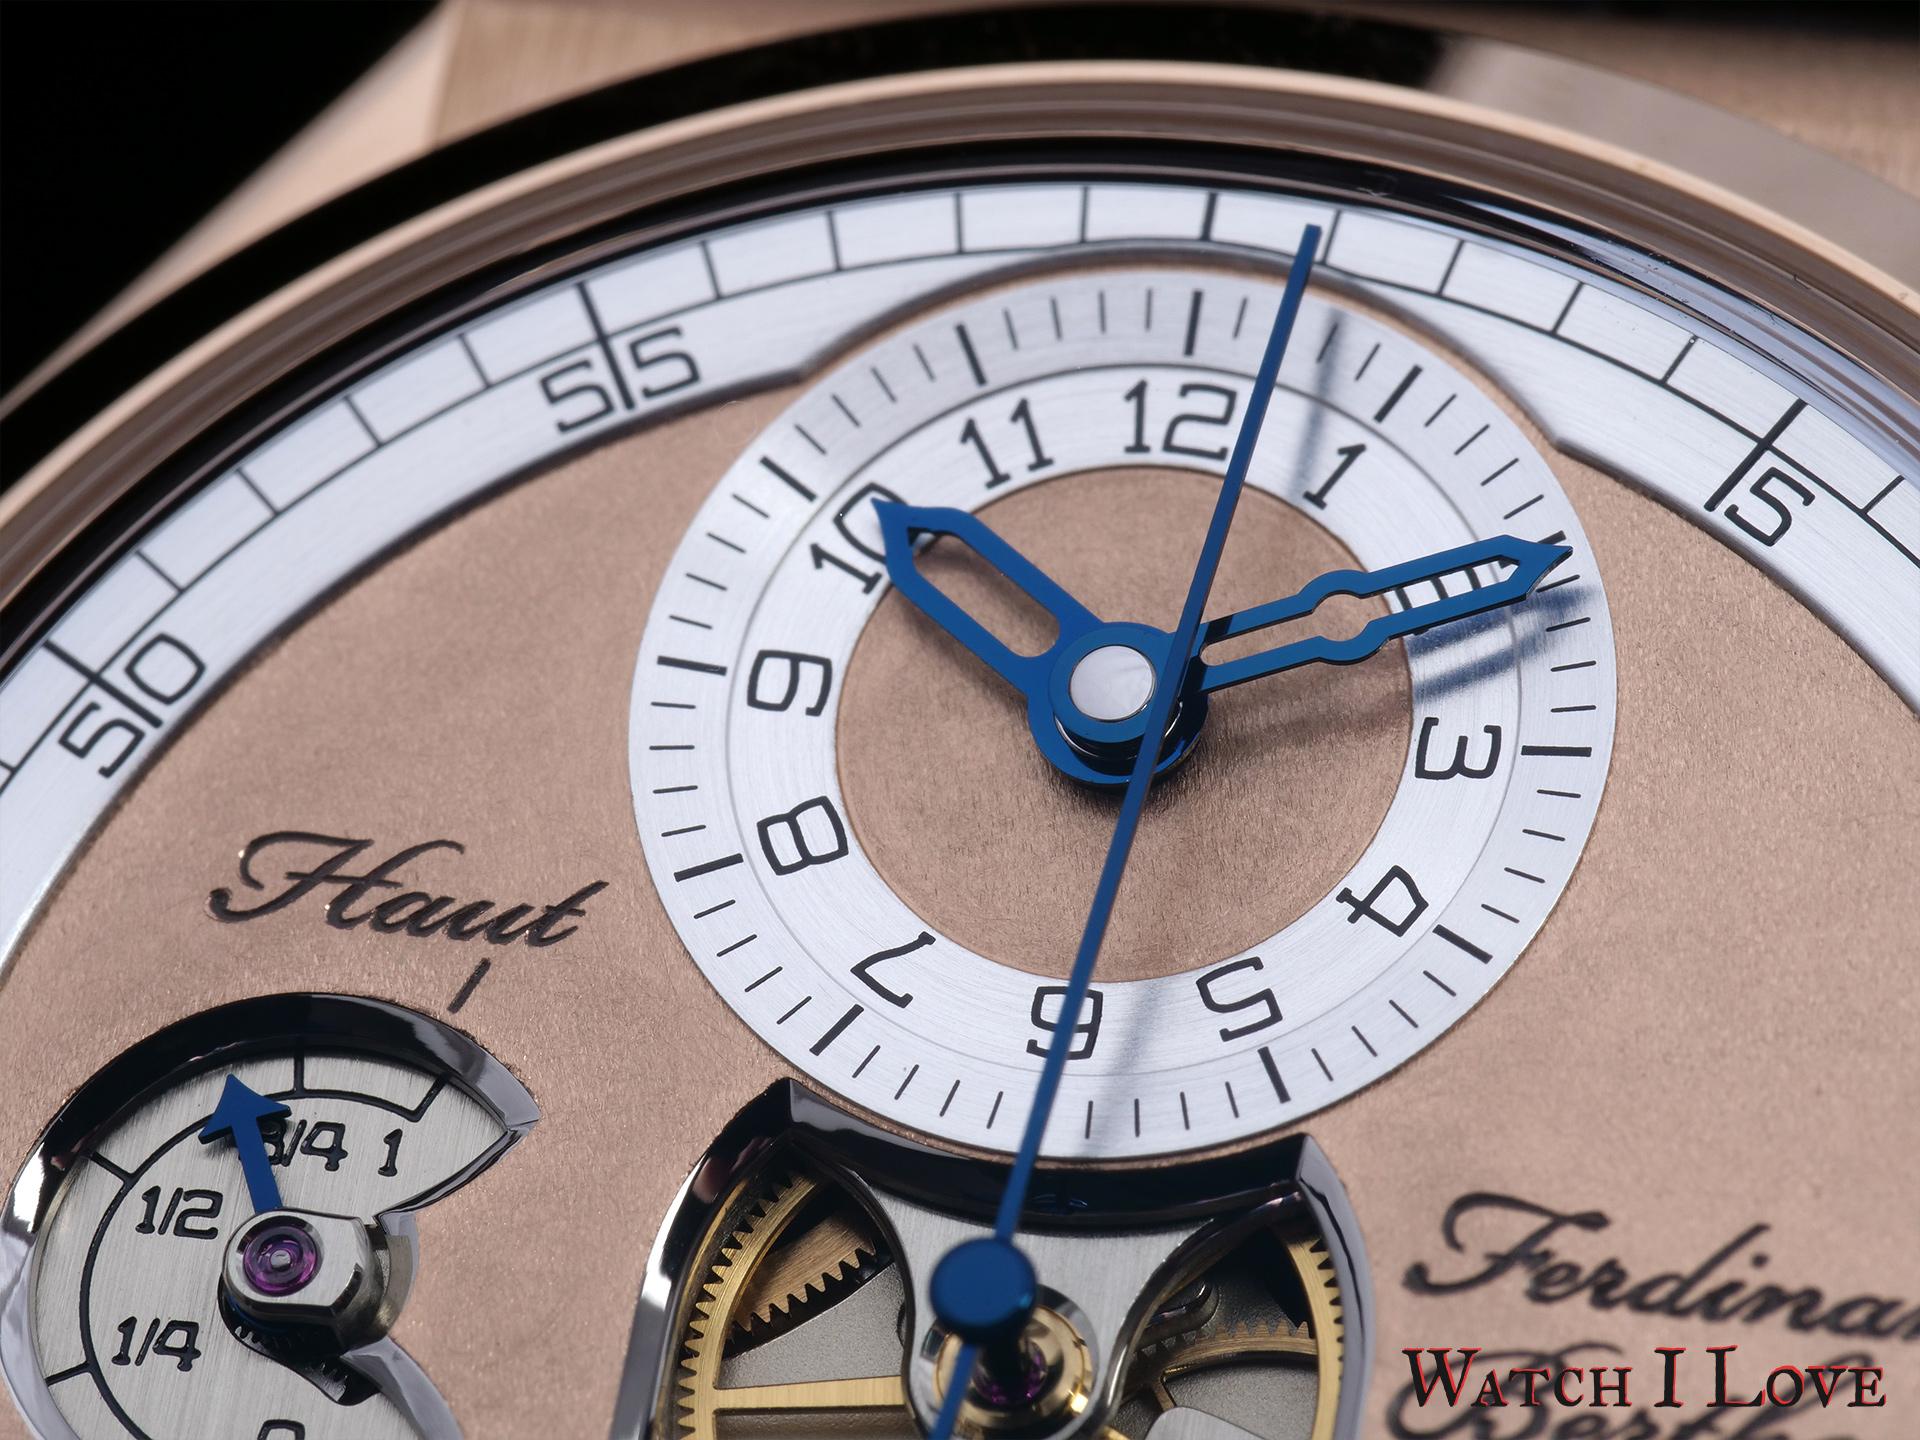 Ferdinand Berthoud Ref. FB 1.2-1 - Dial detail time display